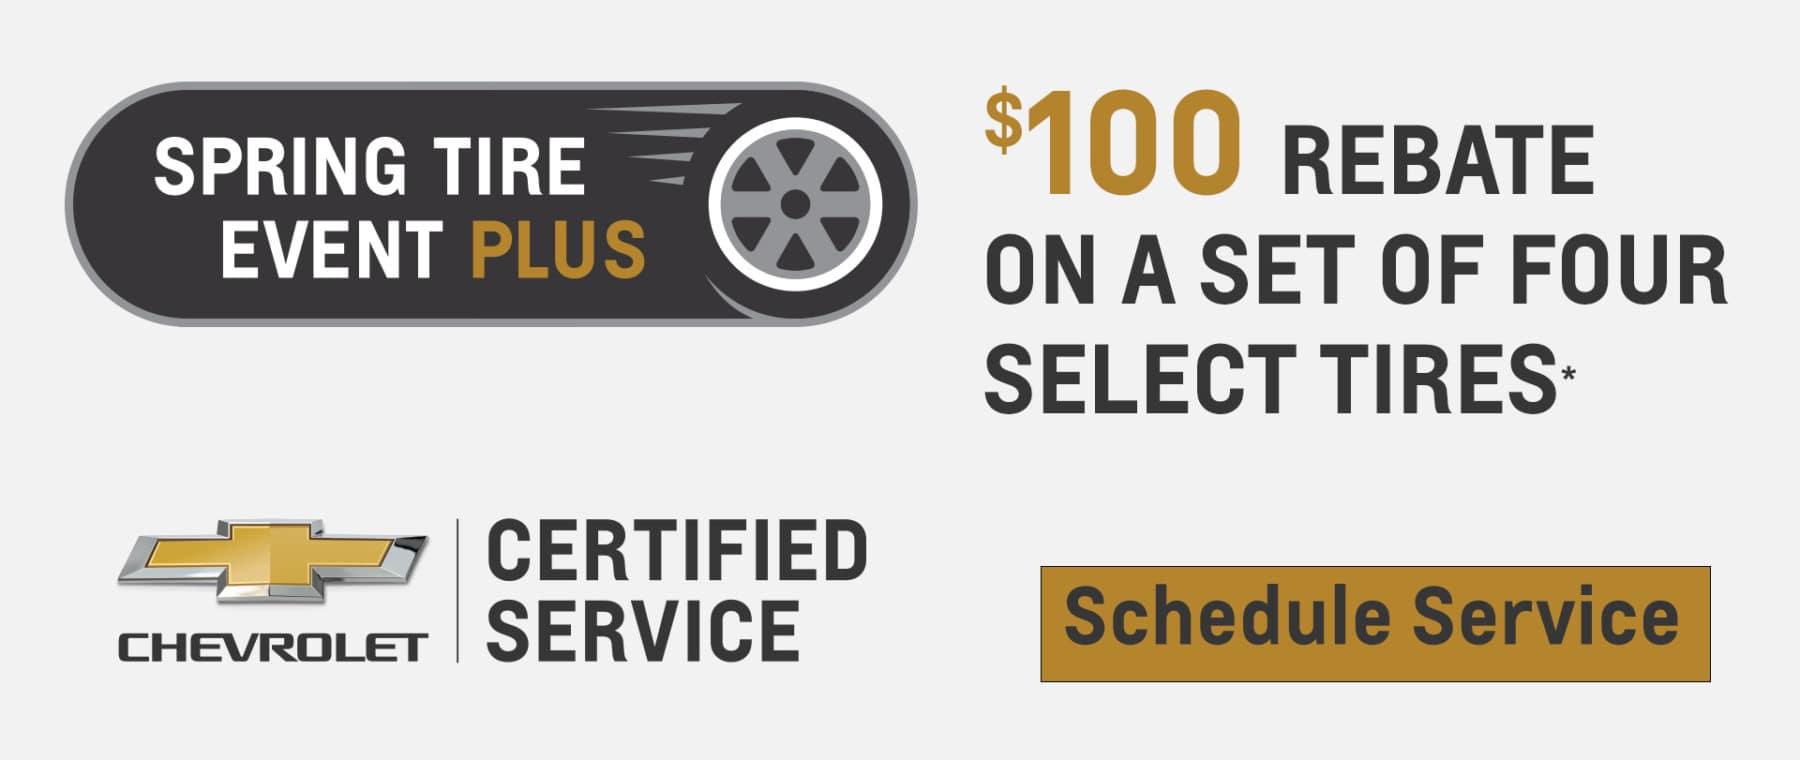 $100 Rebate on select tires.